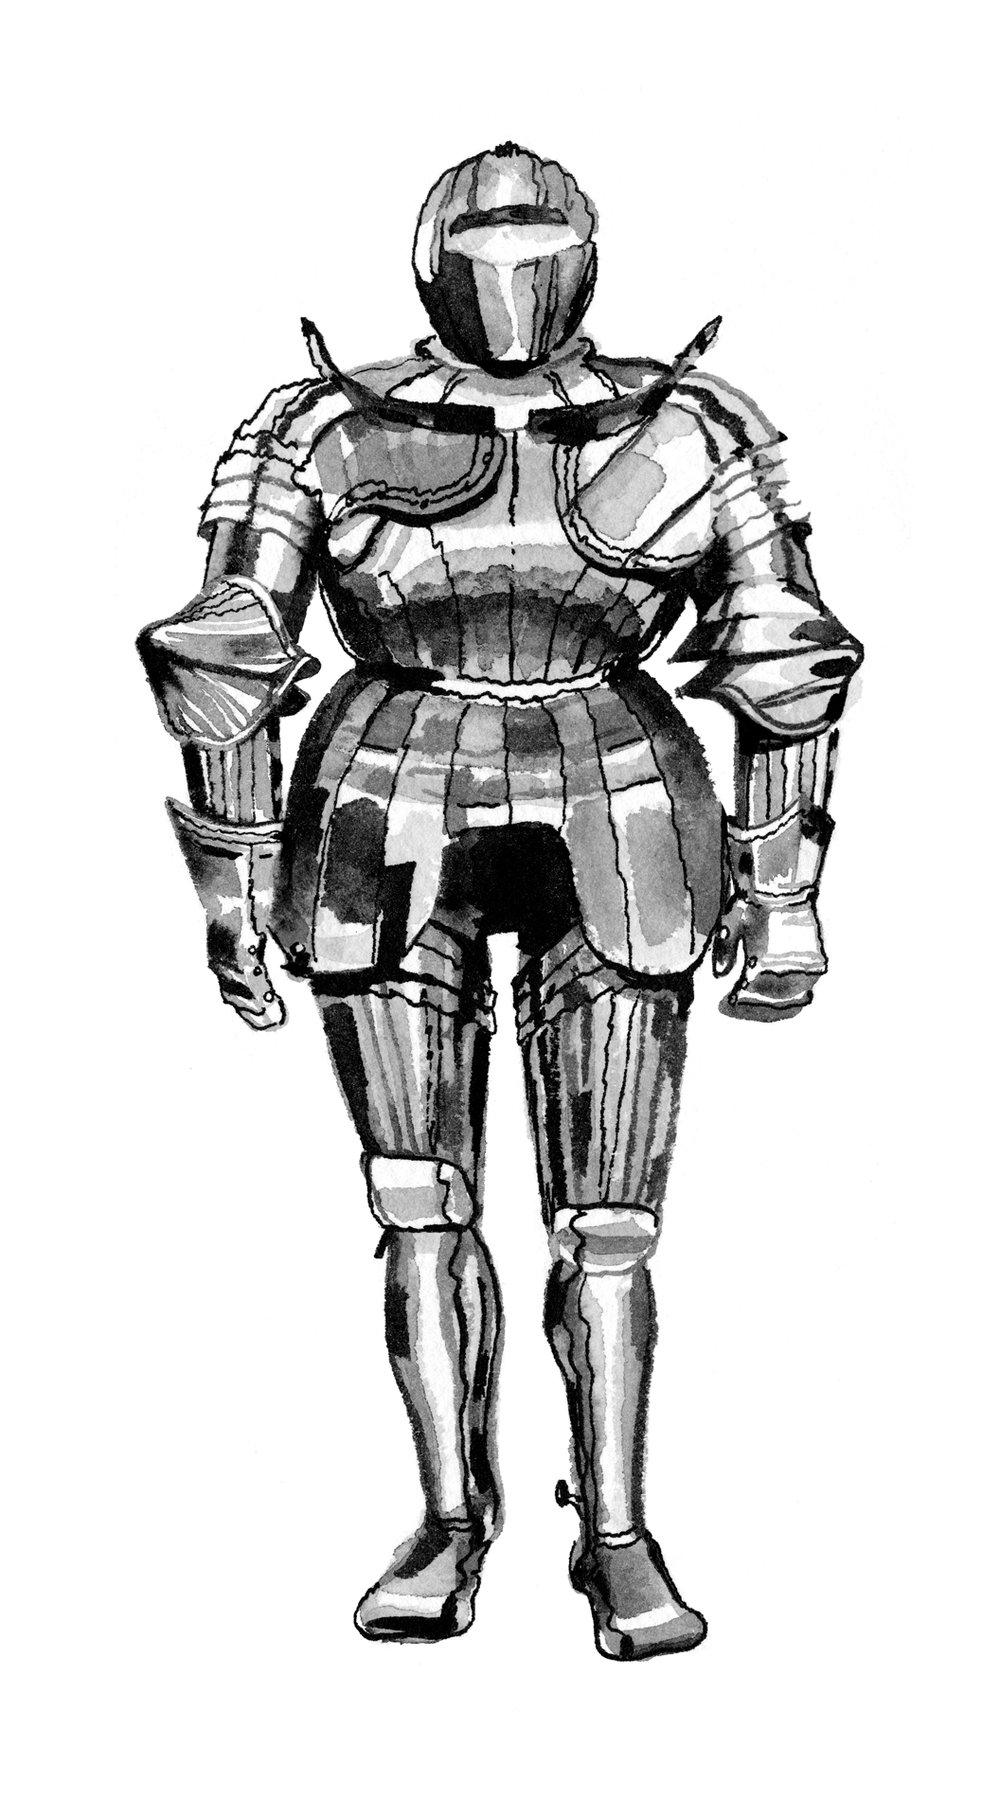 Armor from The Metropolitan Museum of Art